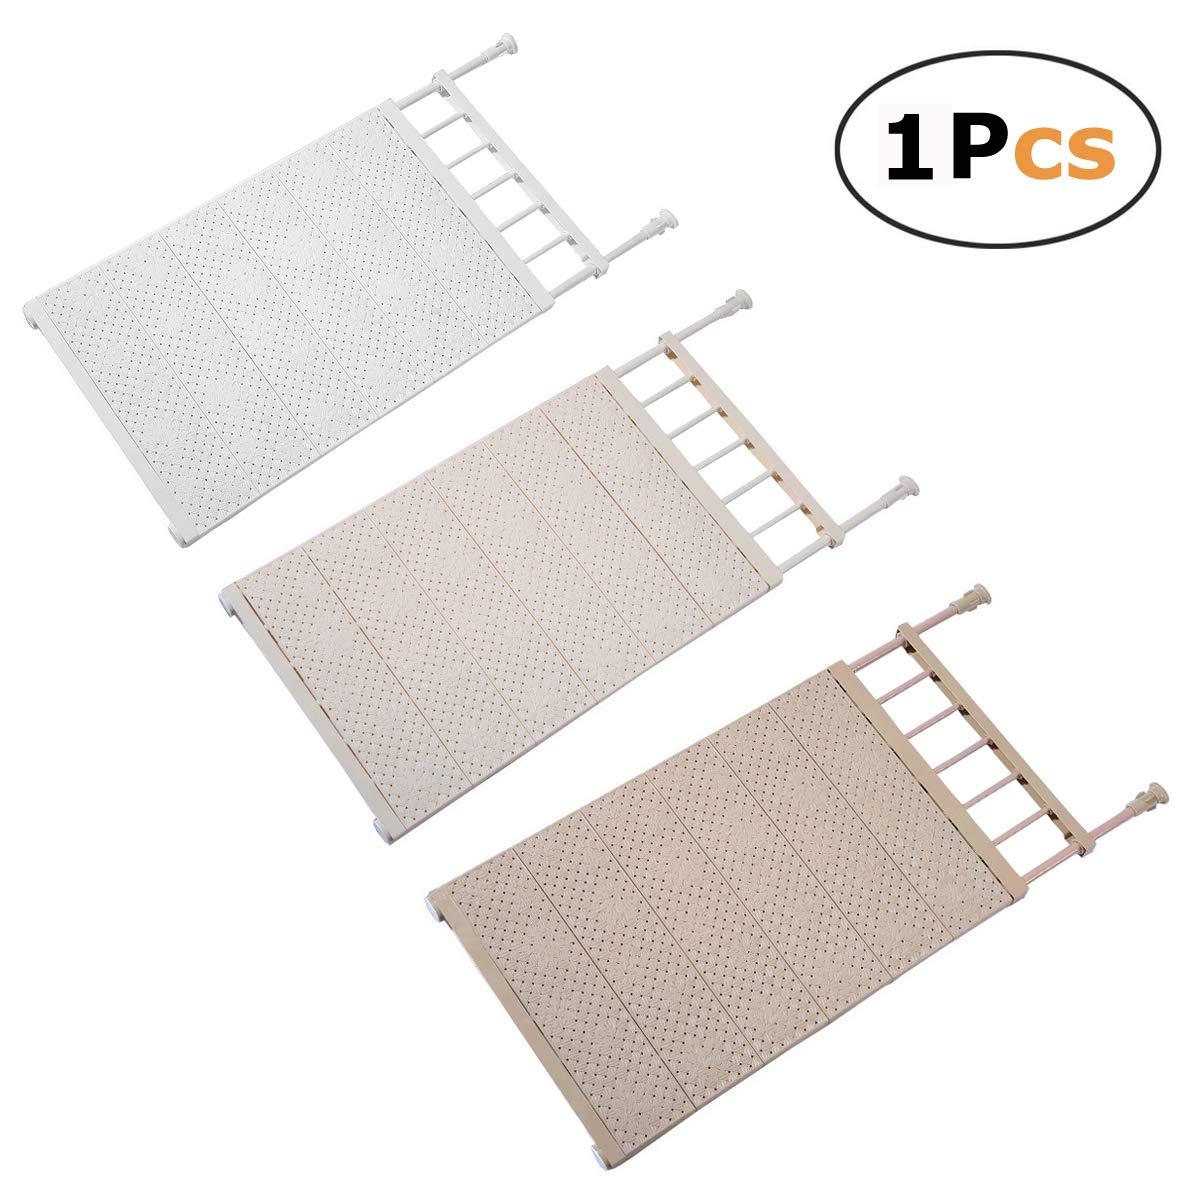 In kds Scalable Layered Separator Updated Version Adjustable Storage Rack Shelf Wardrobe Refrigerator Cupboard Random Colour (53-90) x42cm